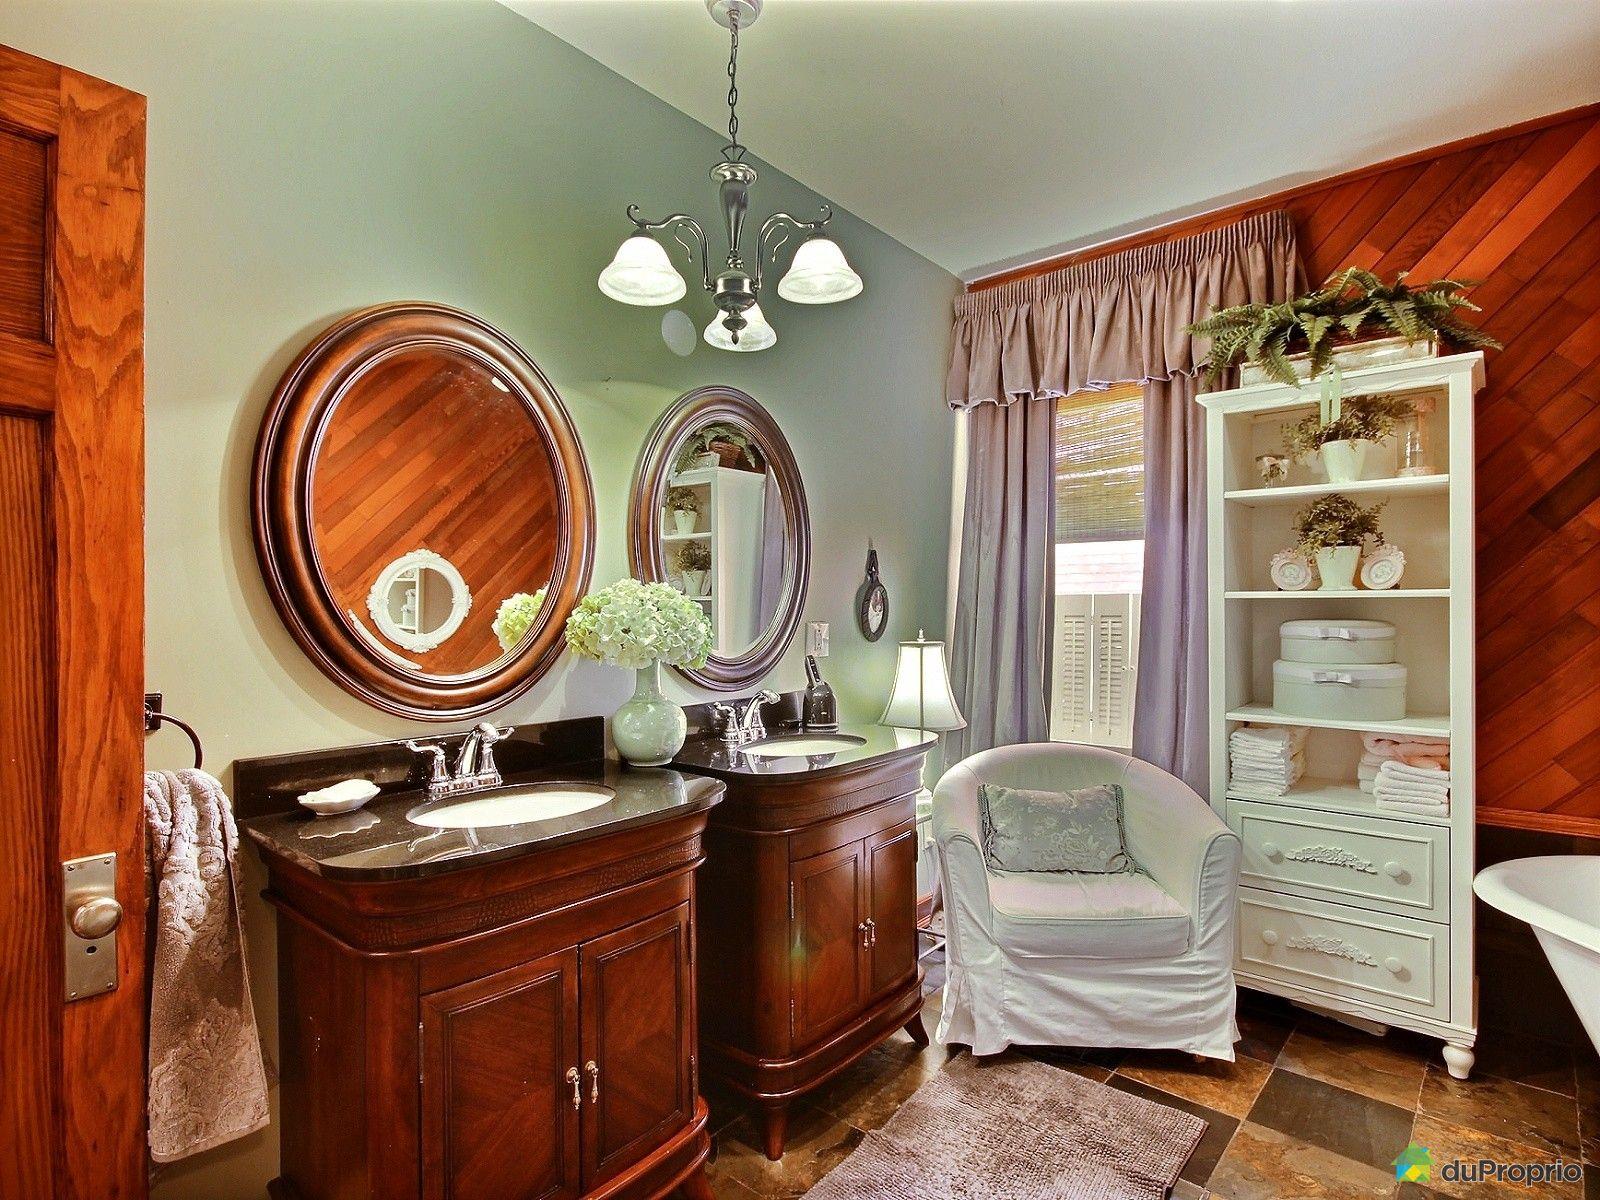 quintuplex vendu montr al immobilier qu bec duproprio. Black Bedroom Furniture Sets. Home Design Ideas